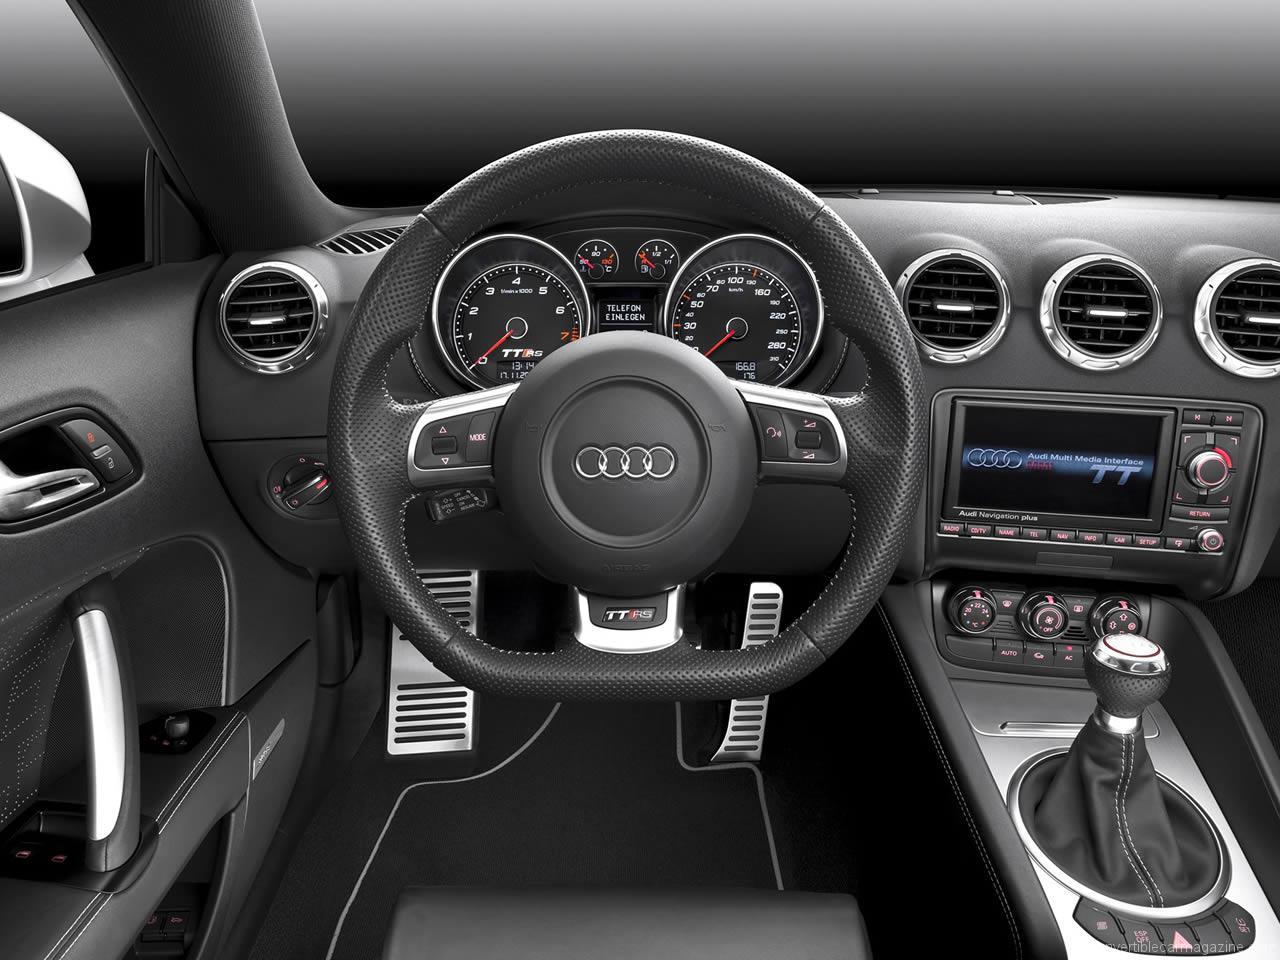 audi tt rs roadster 2009 2015 buying guide rh convertiblecarmagazine com Audi Navigation Maps Audi Navigation System